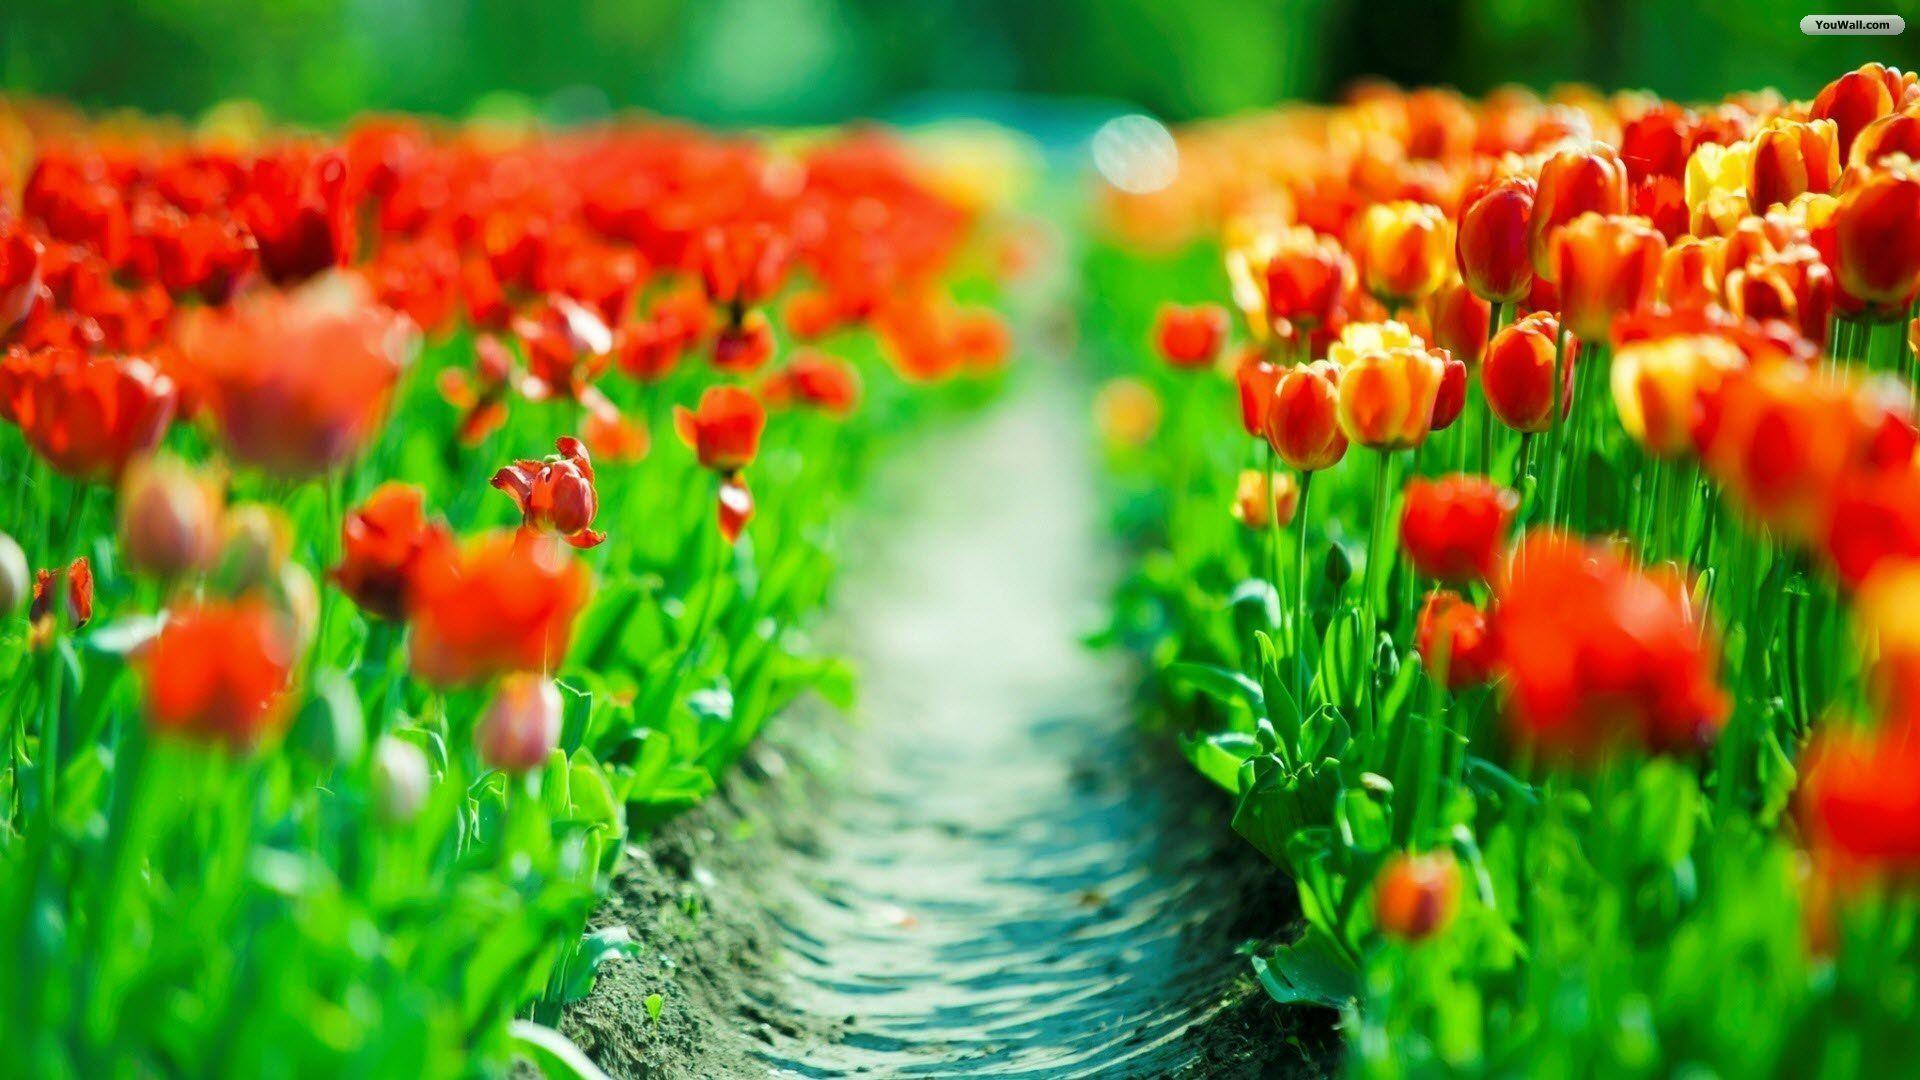 White Tulips Wallpaper - WallpaperSafari